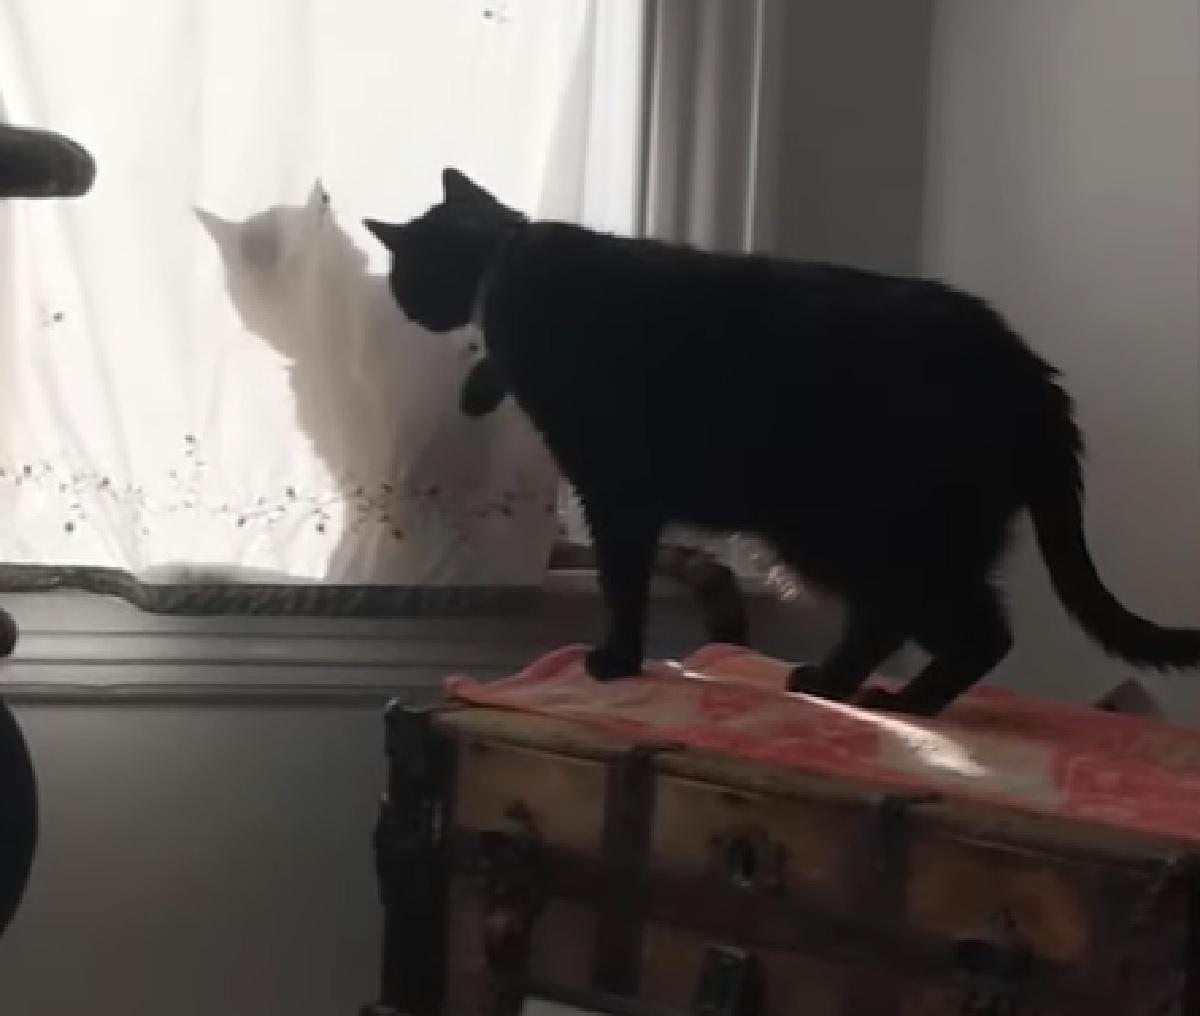 hal gattino ombra tenda curiosità